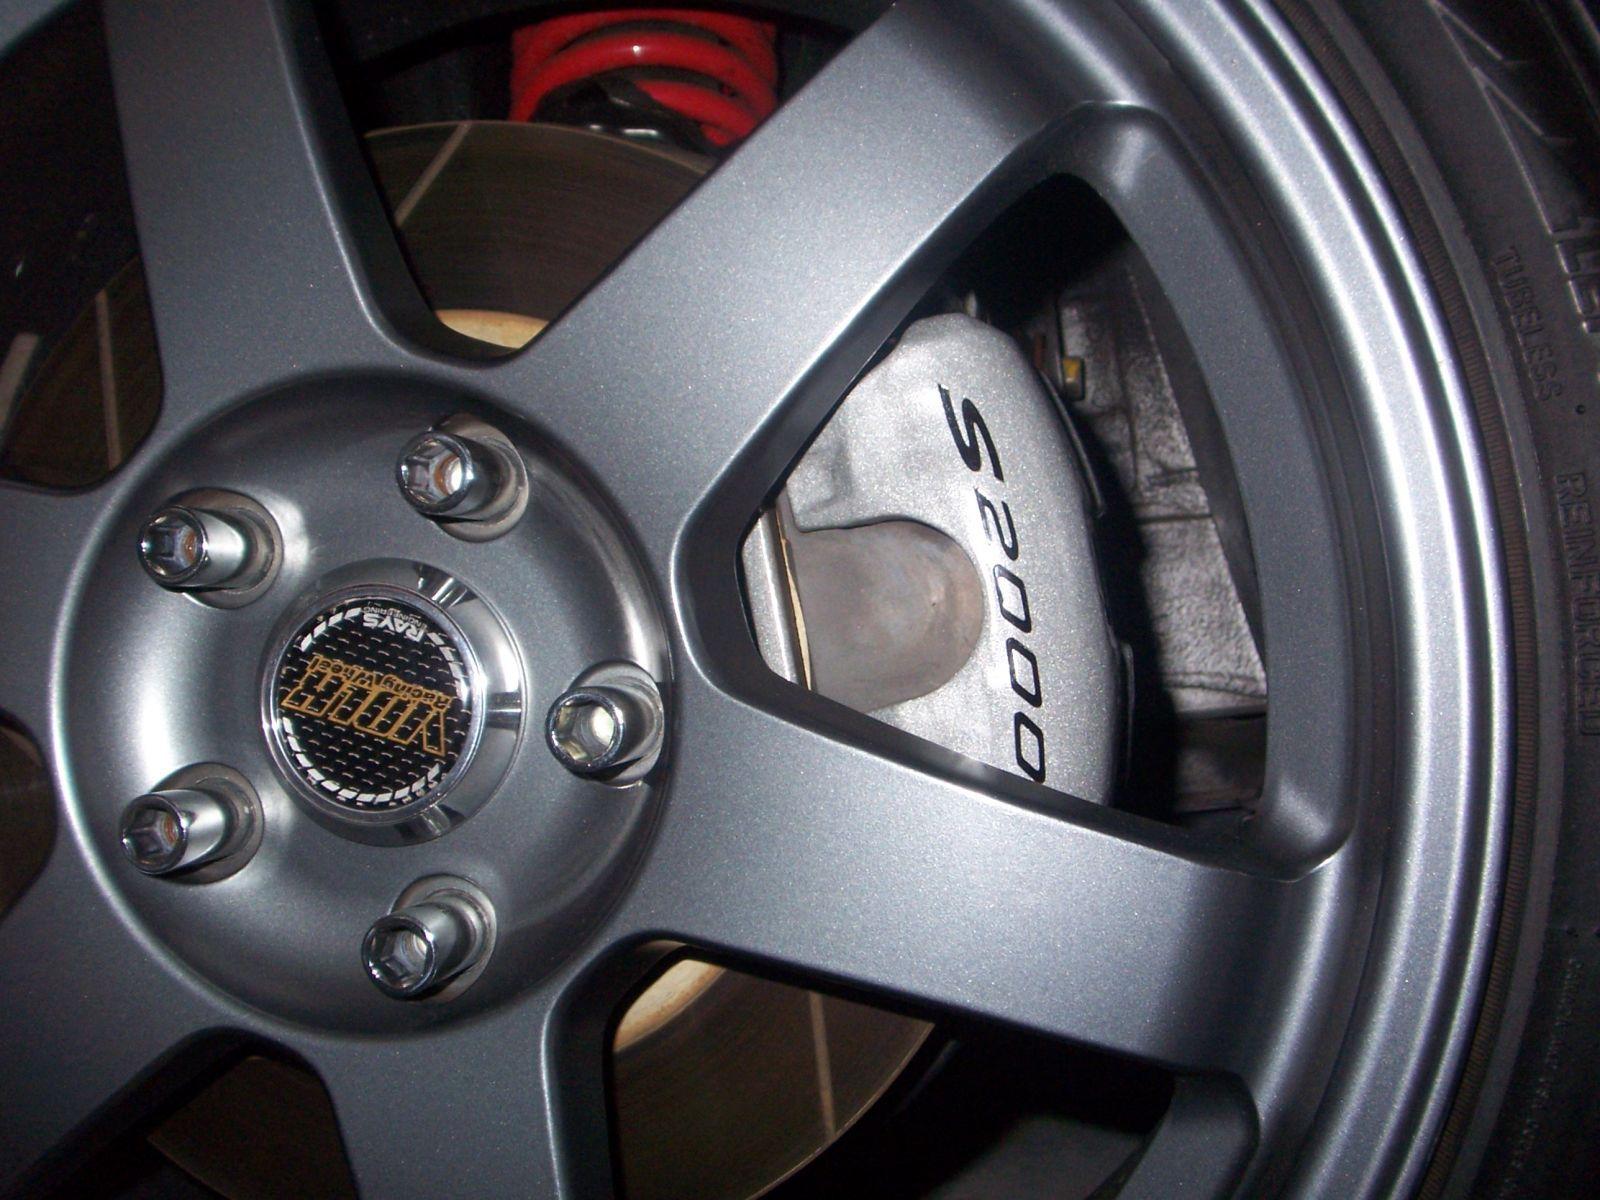 Painting Brake Calipers S2ki Honda S2000 Forums